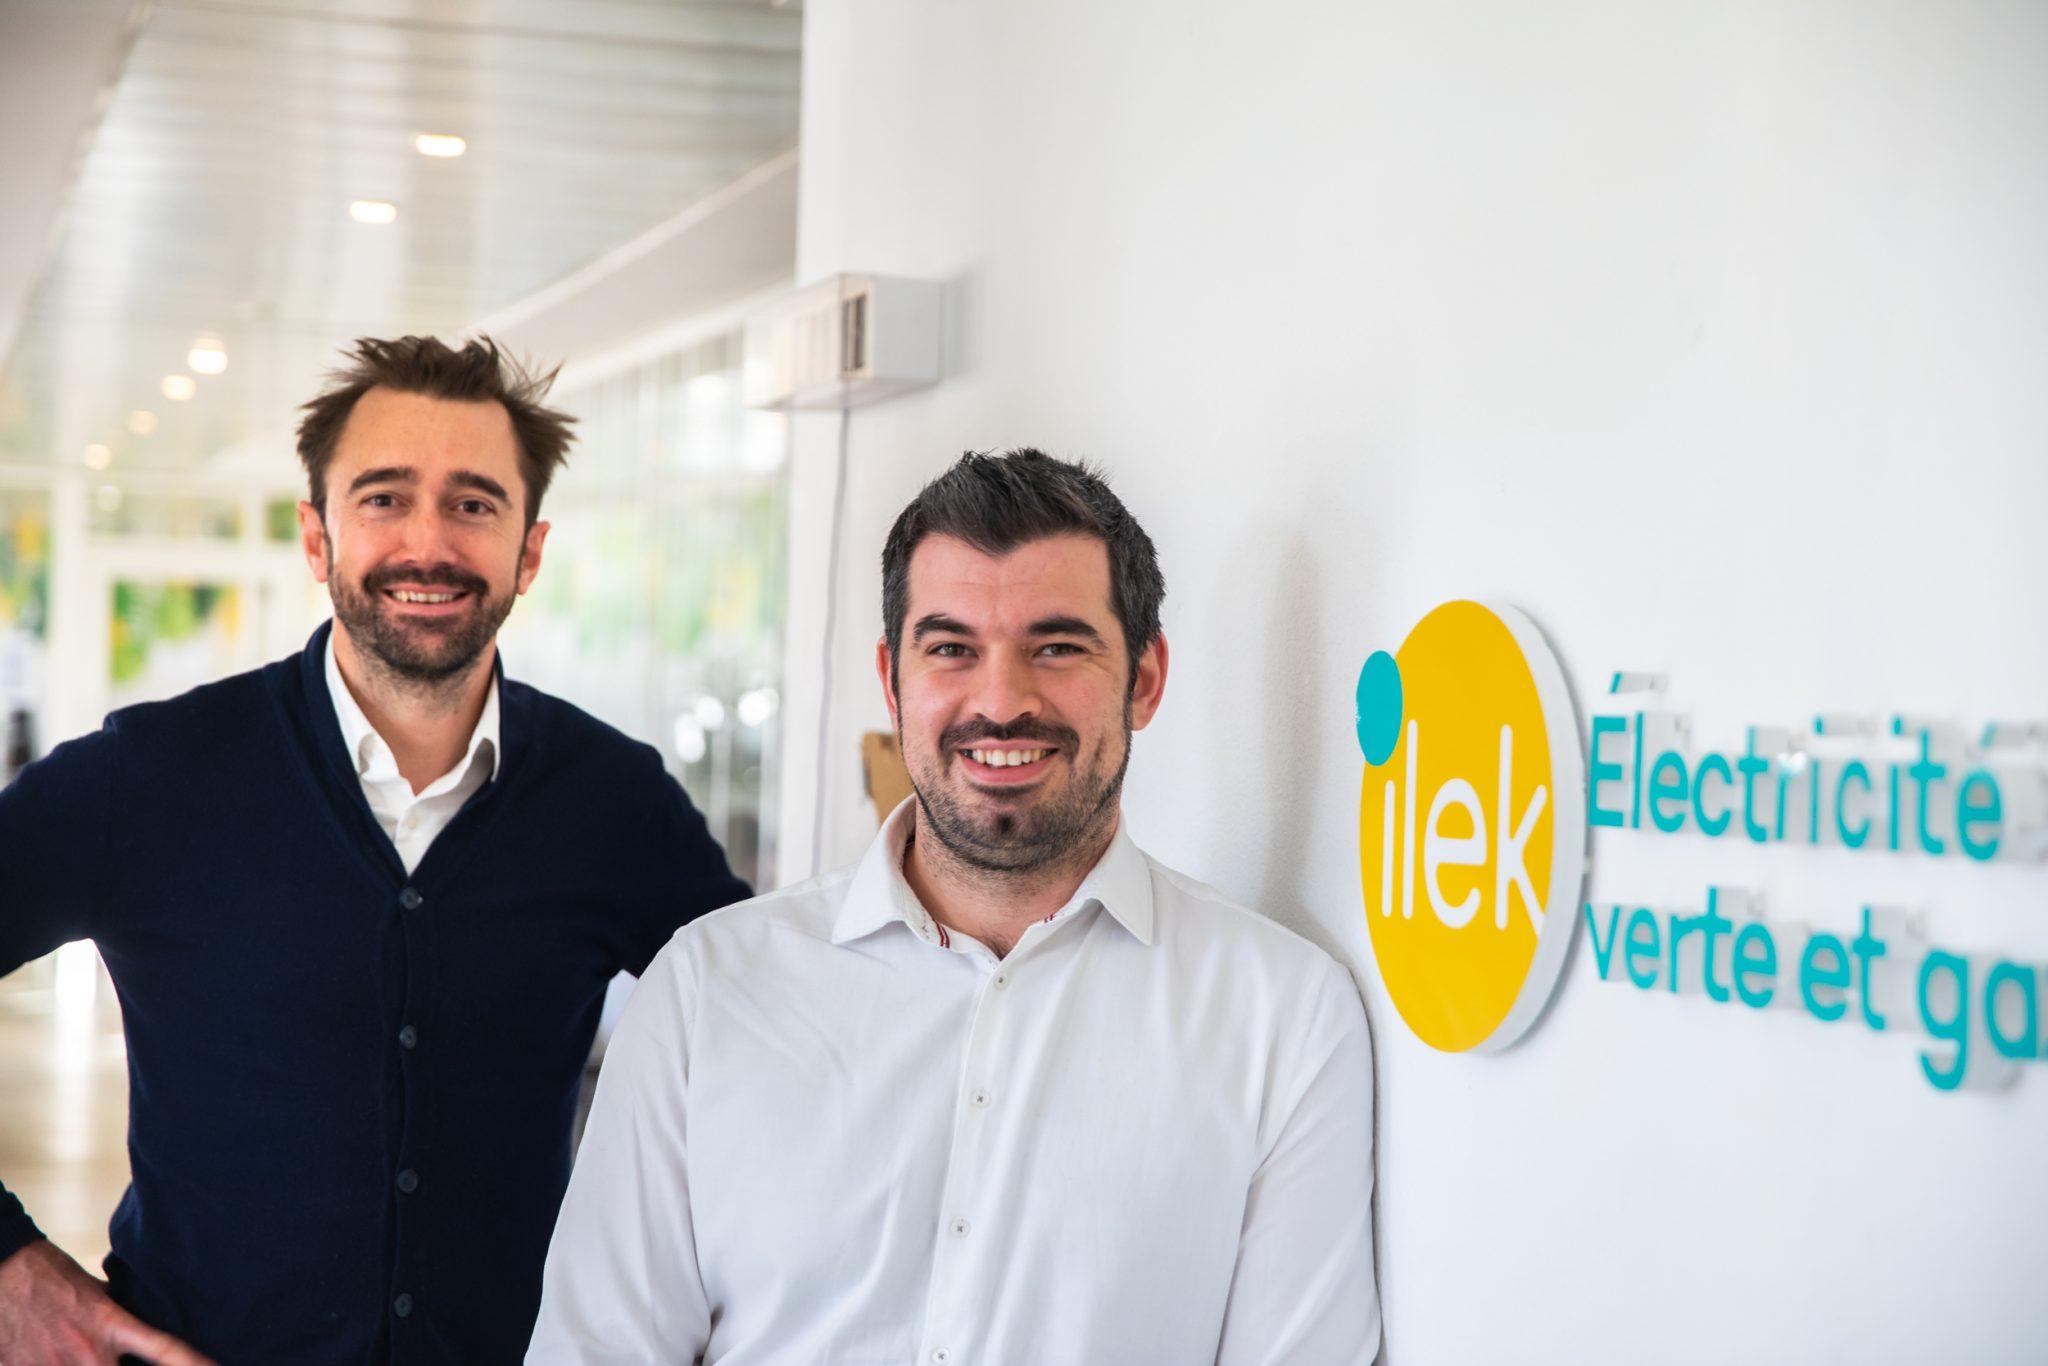 Photo of Rémy Companyo and Julien Chardon, cofounders of B Corp ilek.